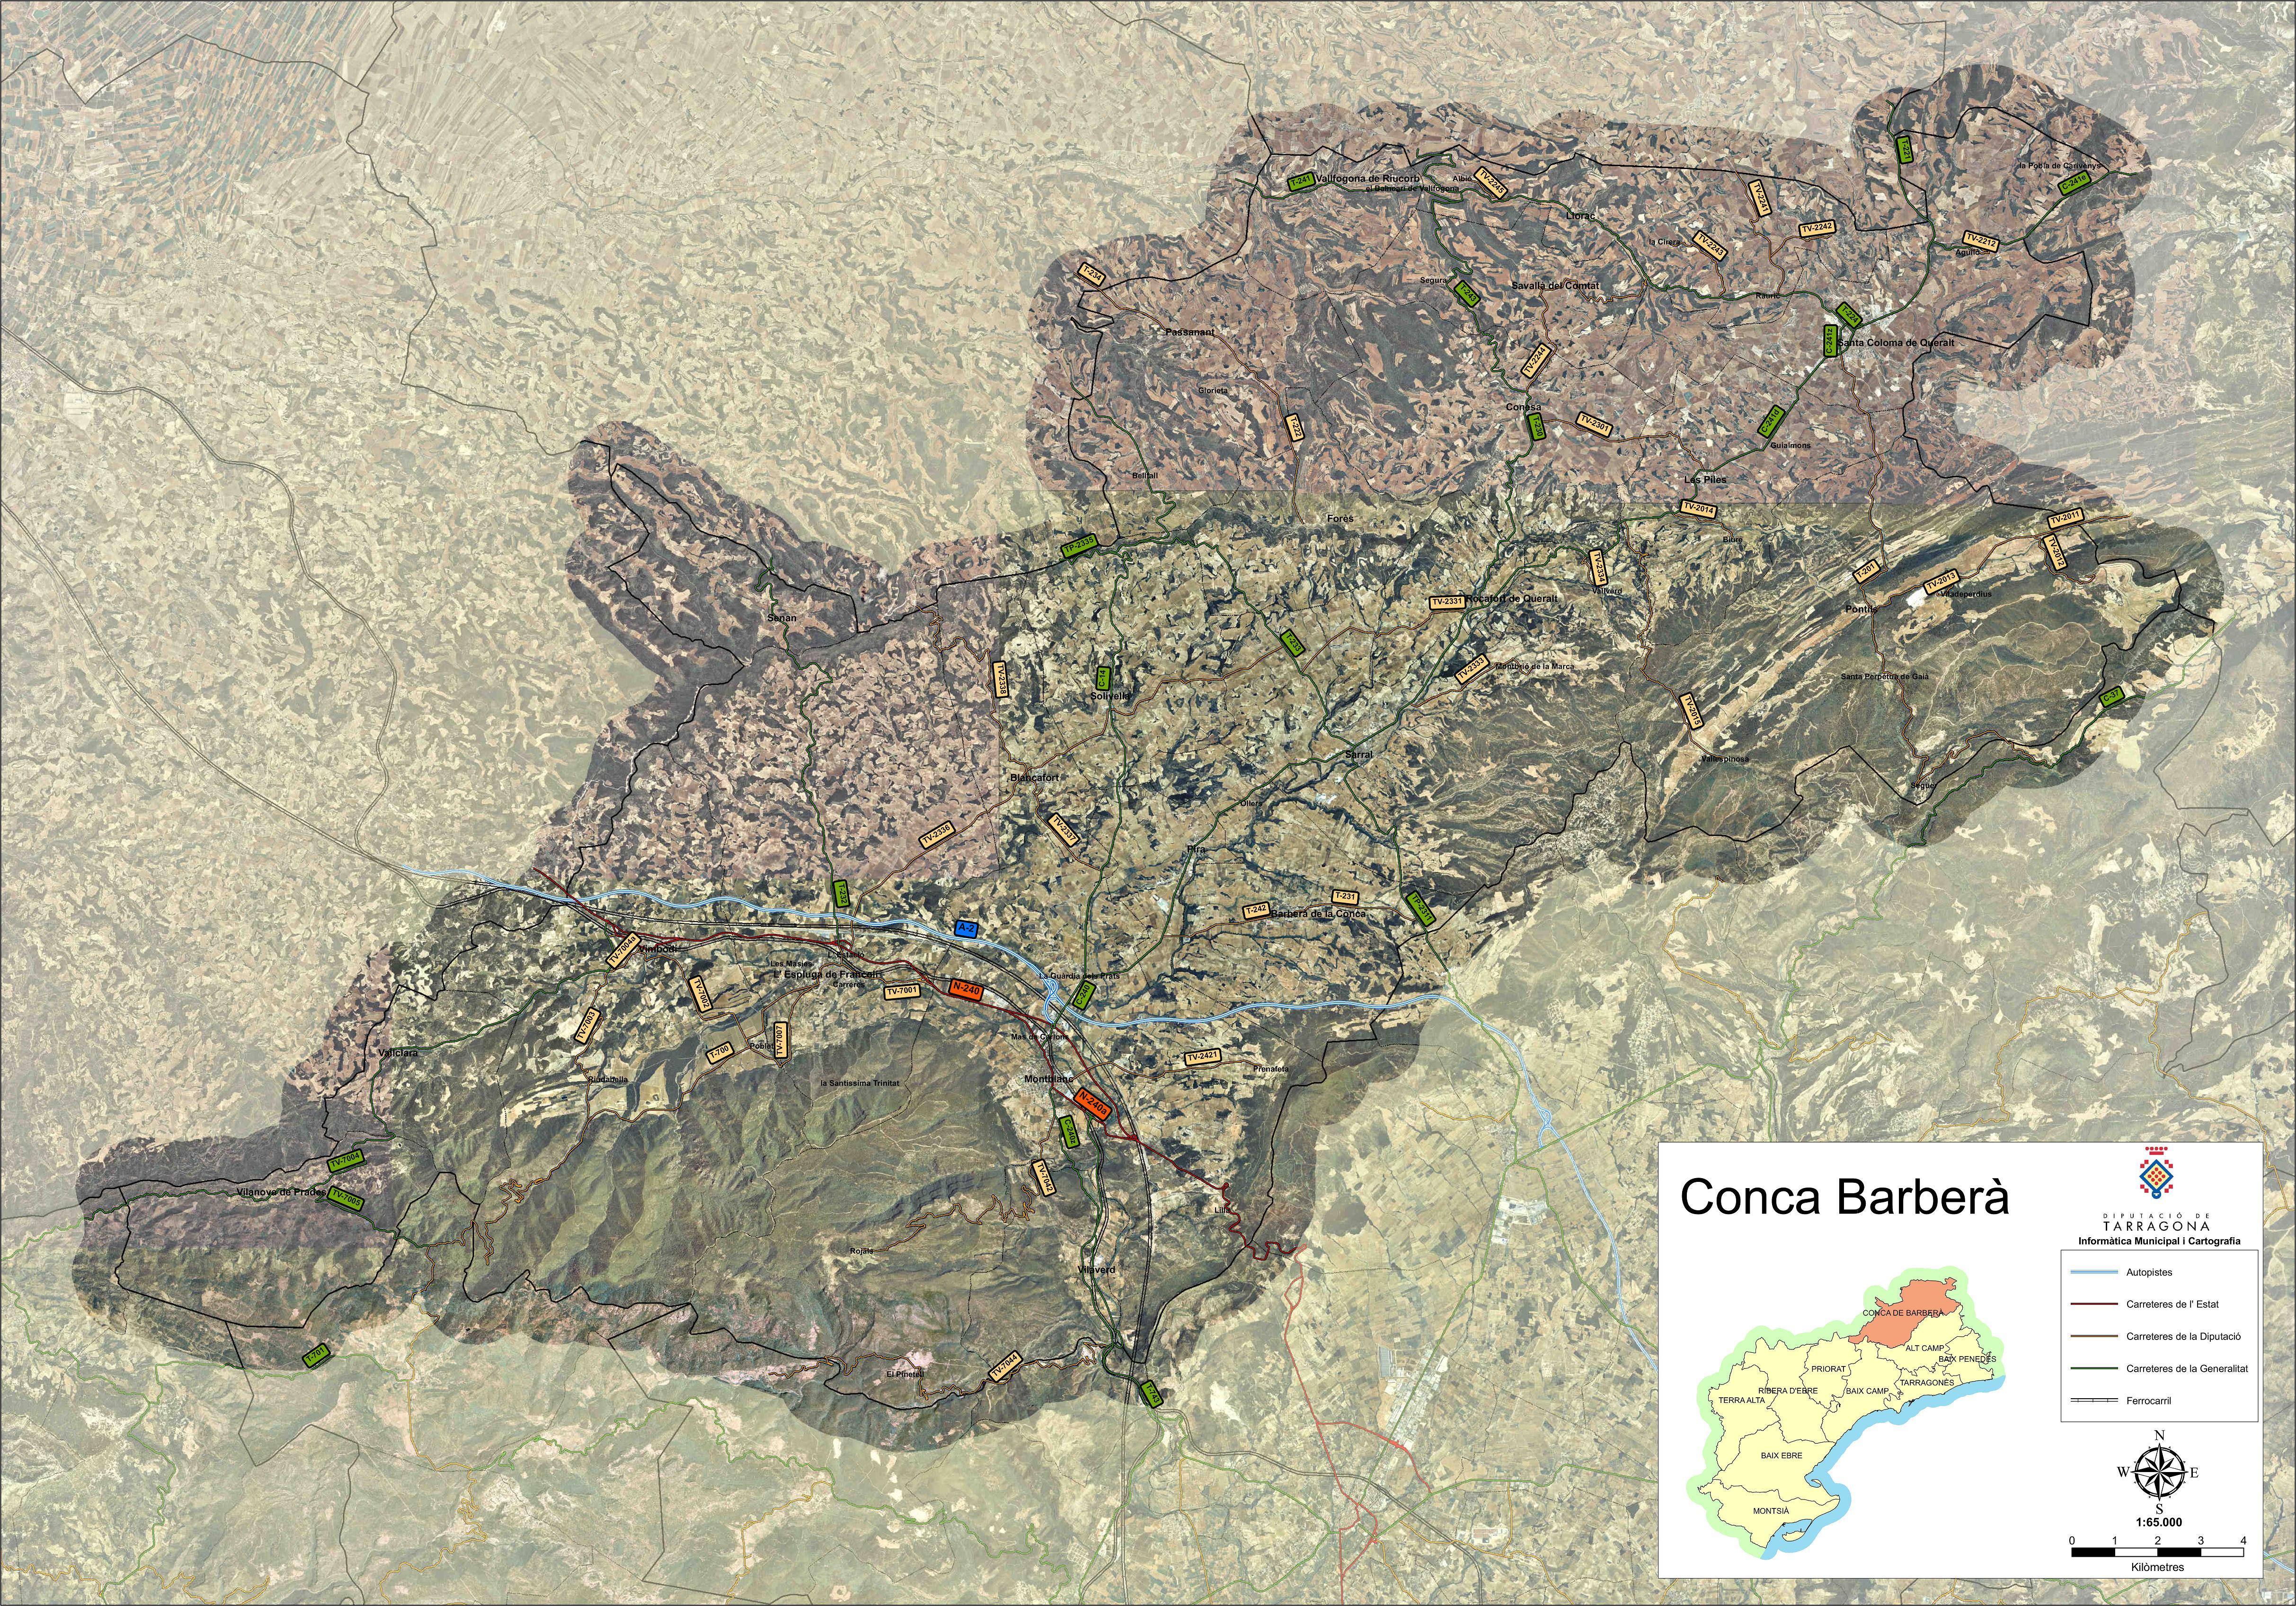 Satellite and road map of the comarca of Conca de Barberà